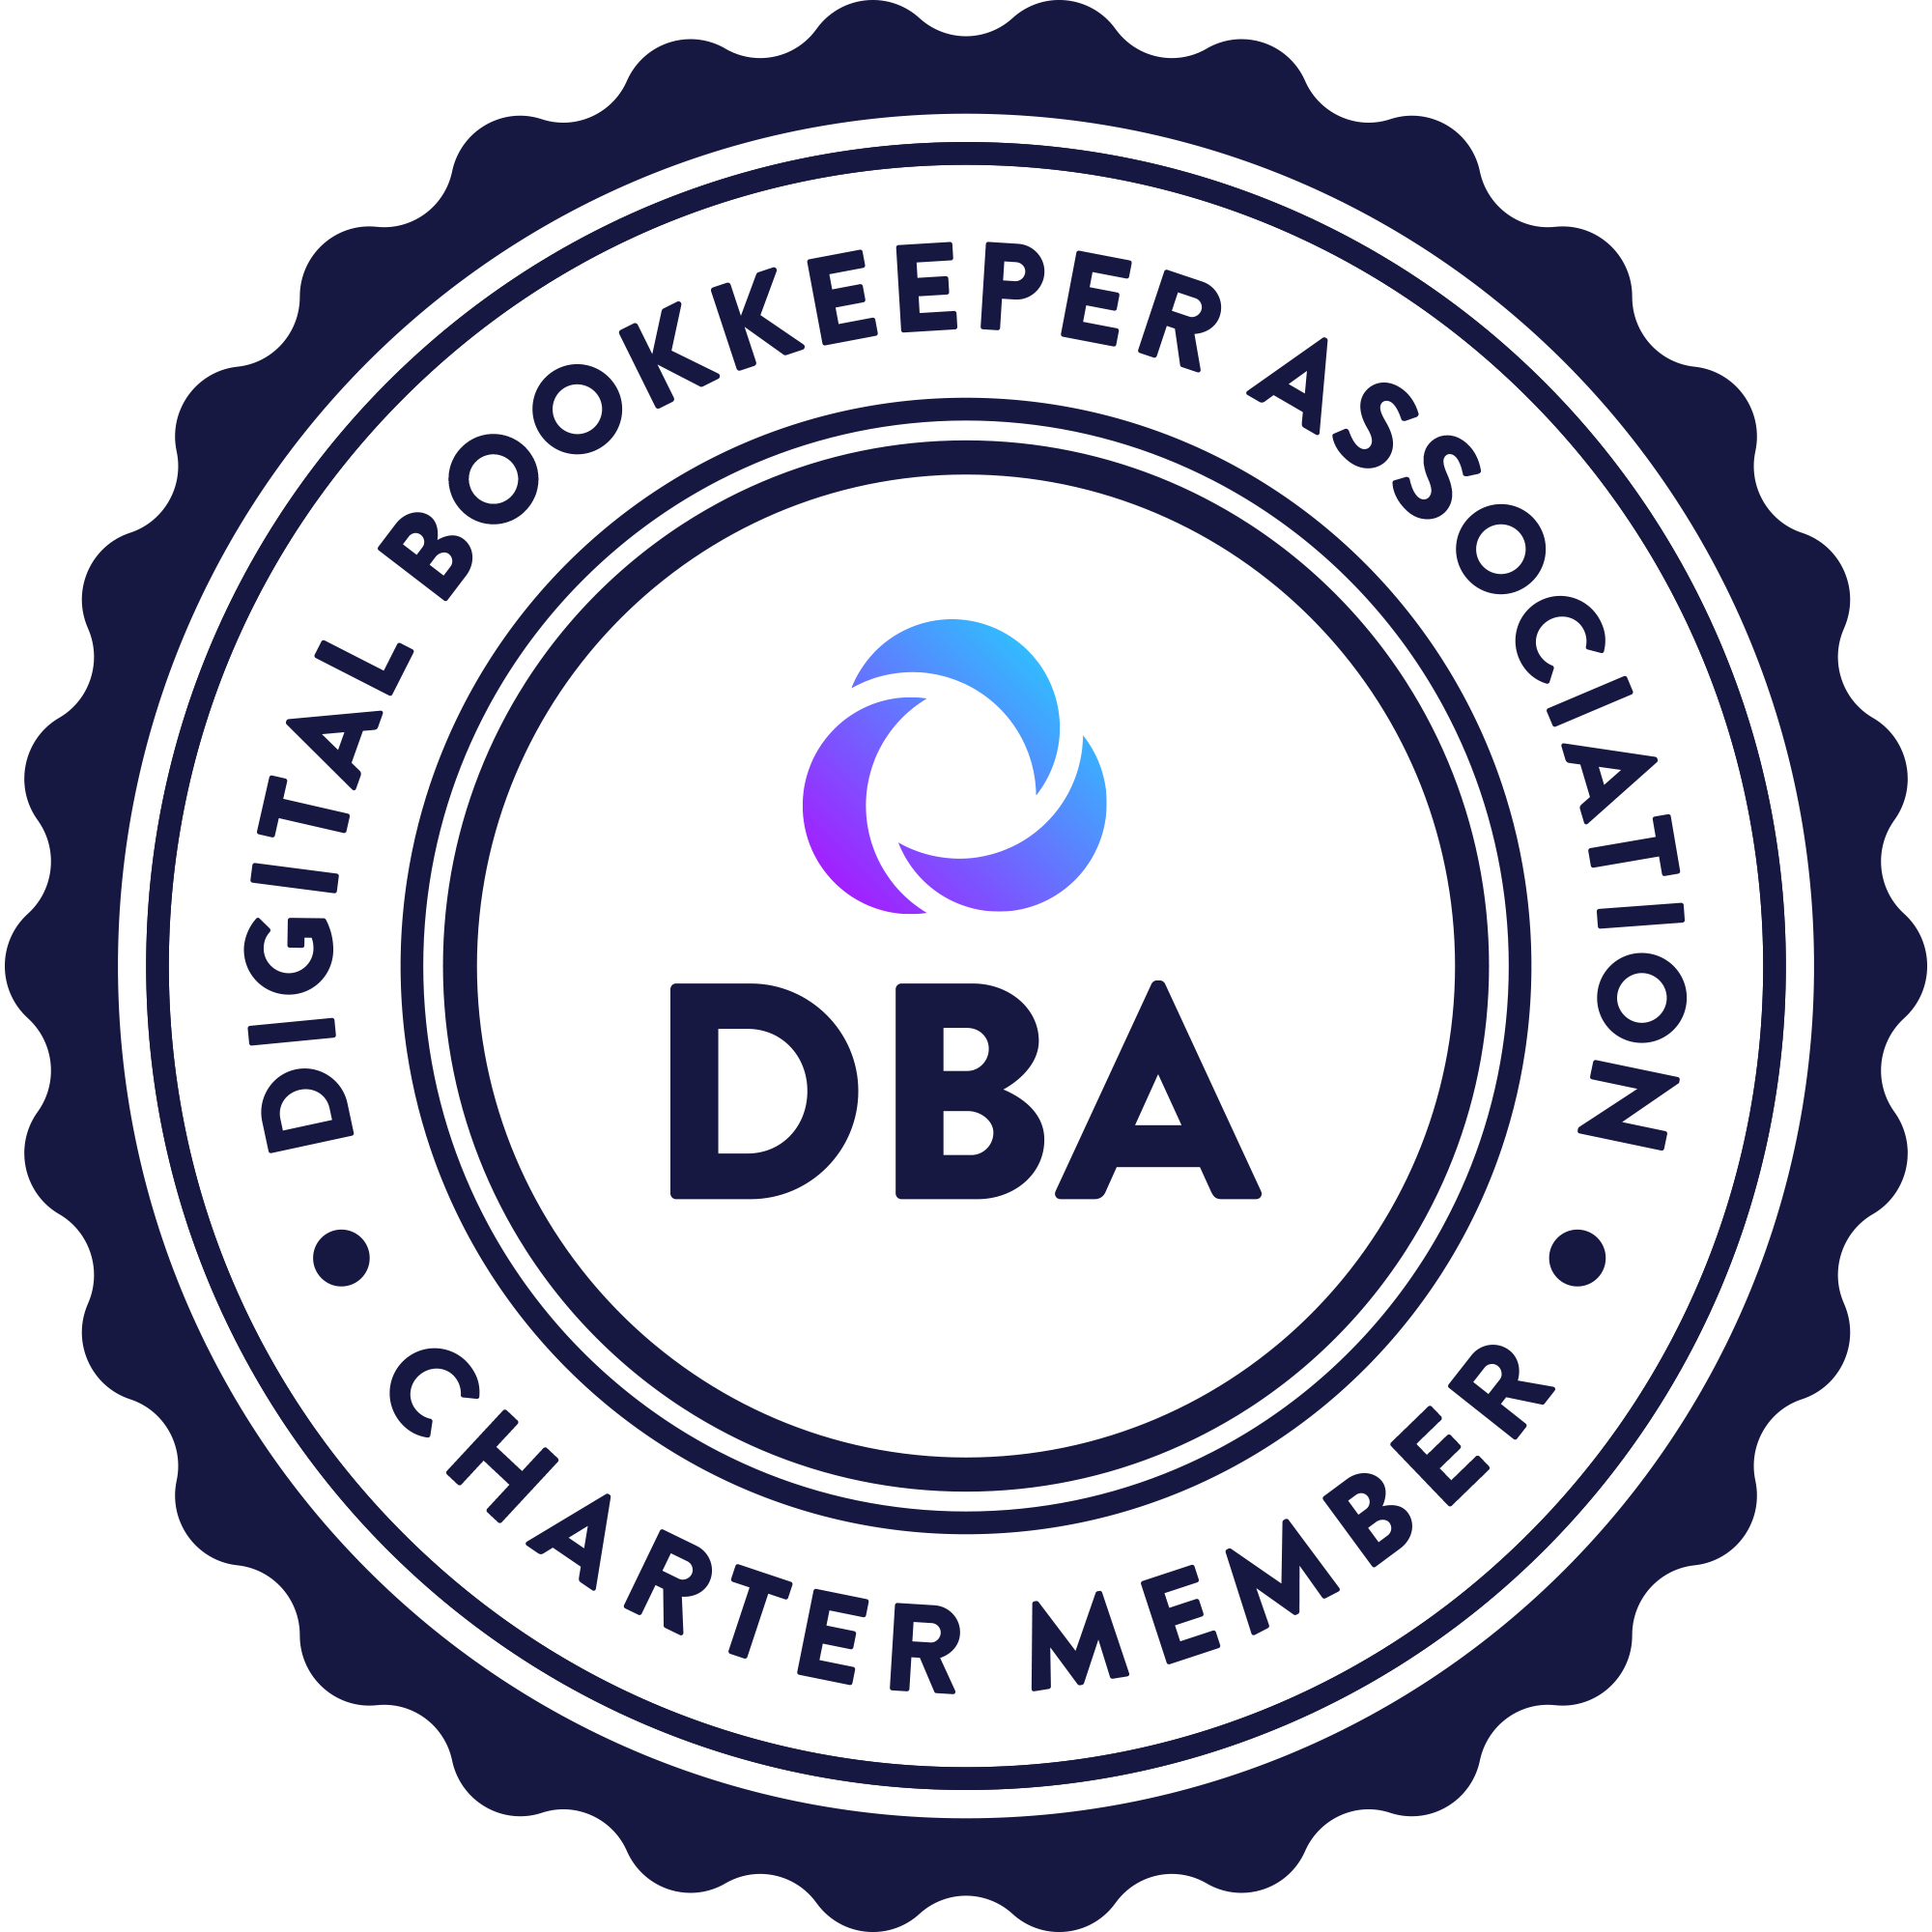 Digital Bookkeeper Association Charter Member